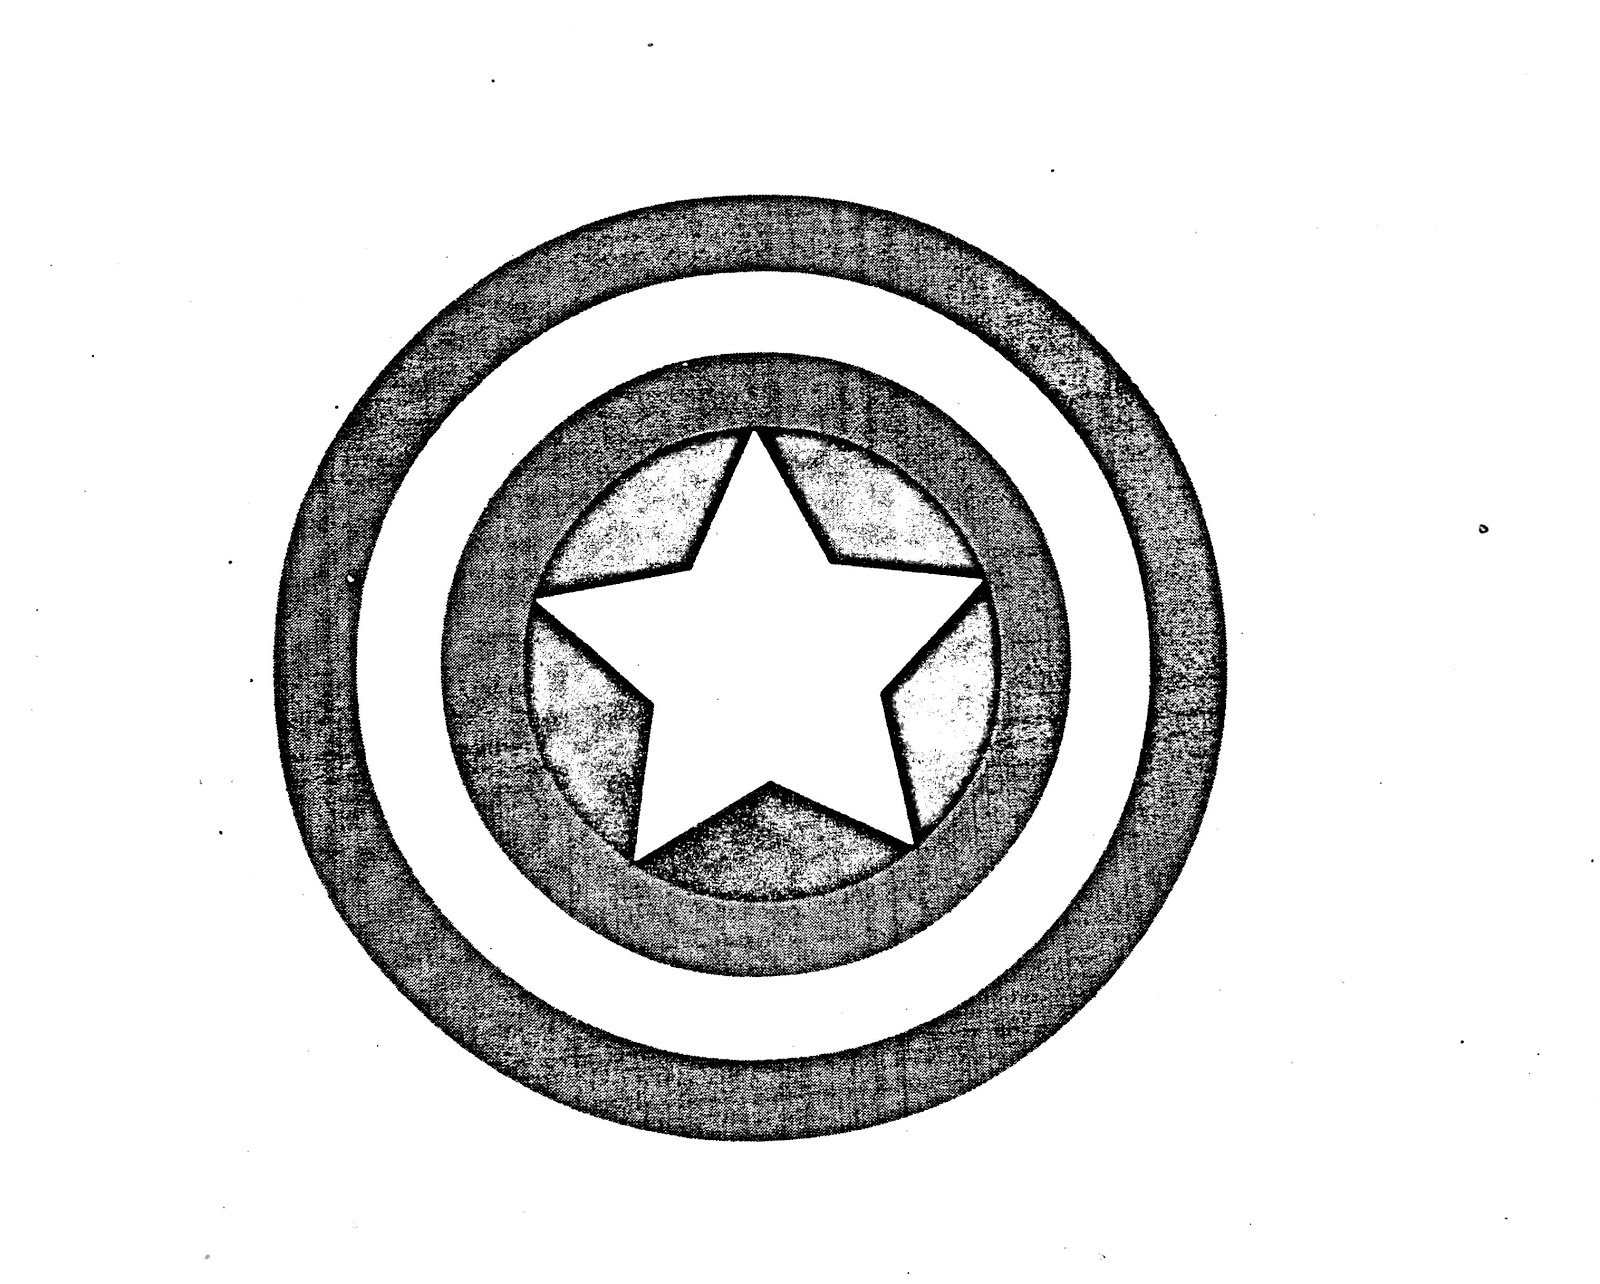 Capitan America Para Colorear: MANUALIDADES AIDE CARRASCO: Dulcero Capitan America